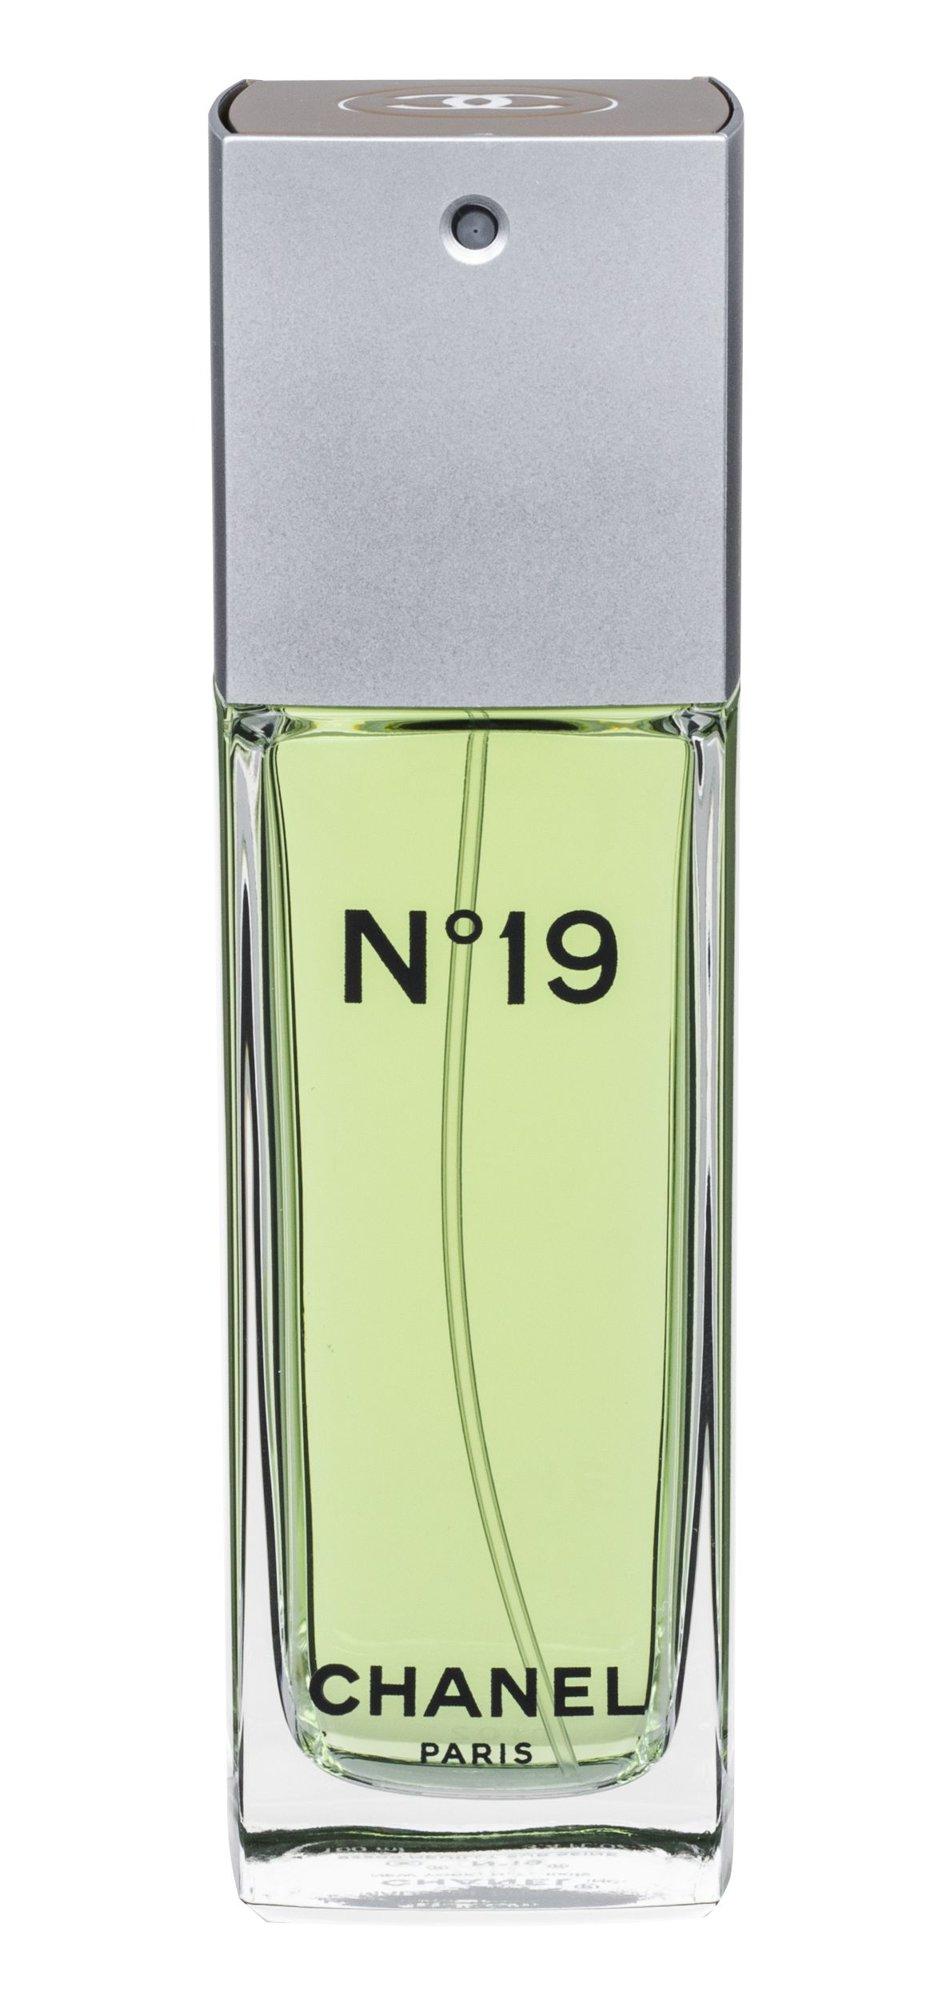 Chanel No. 19 EDT 100ml